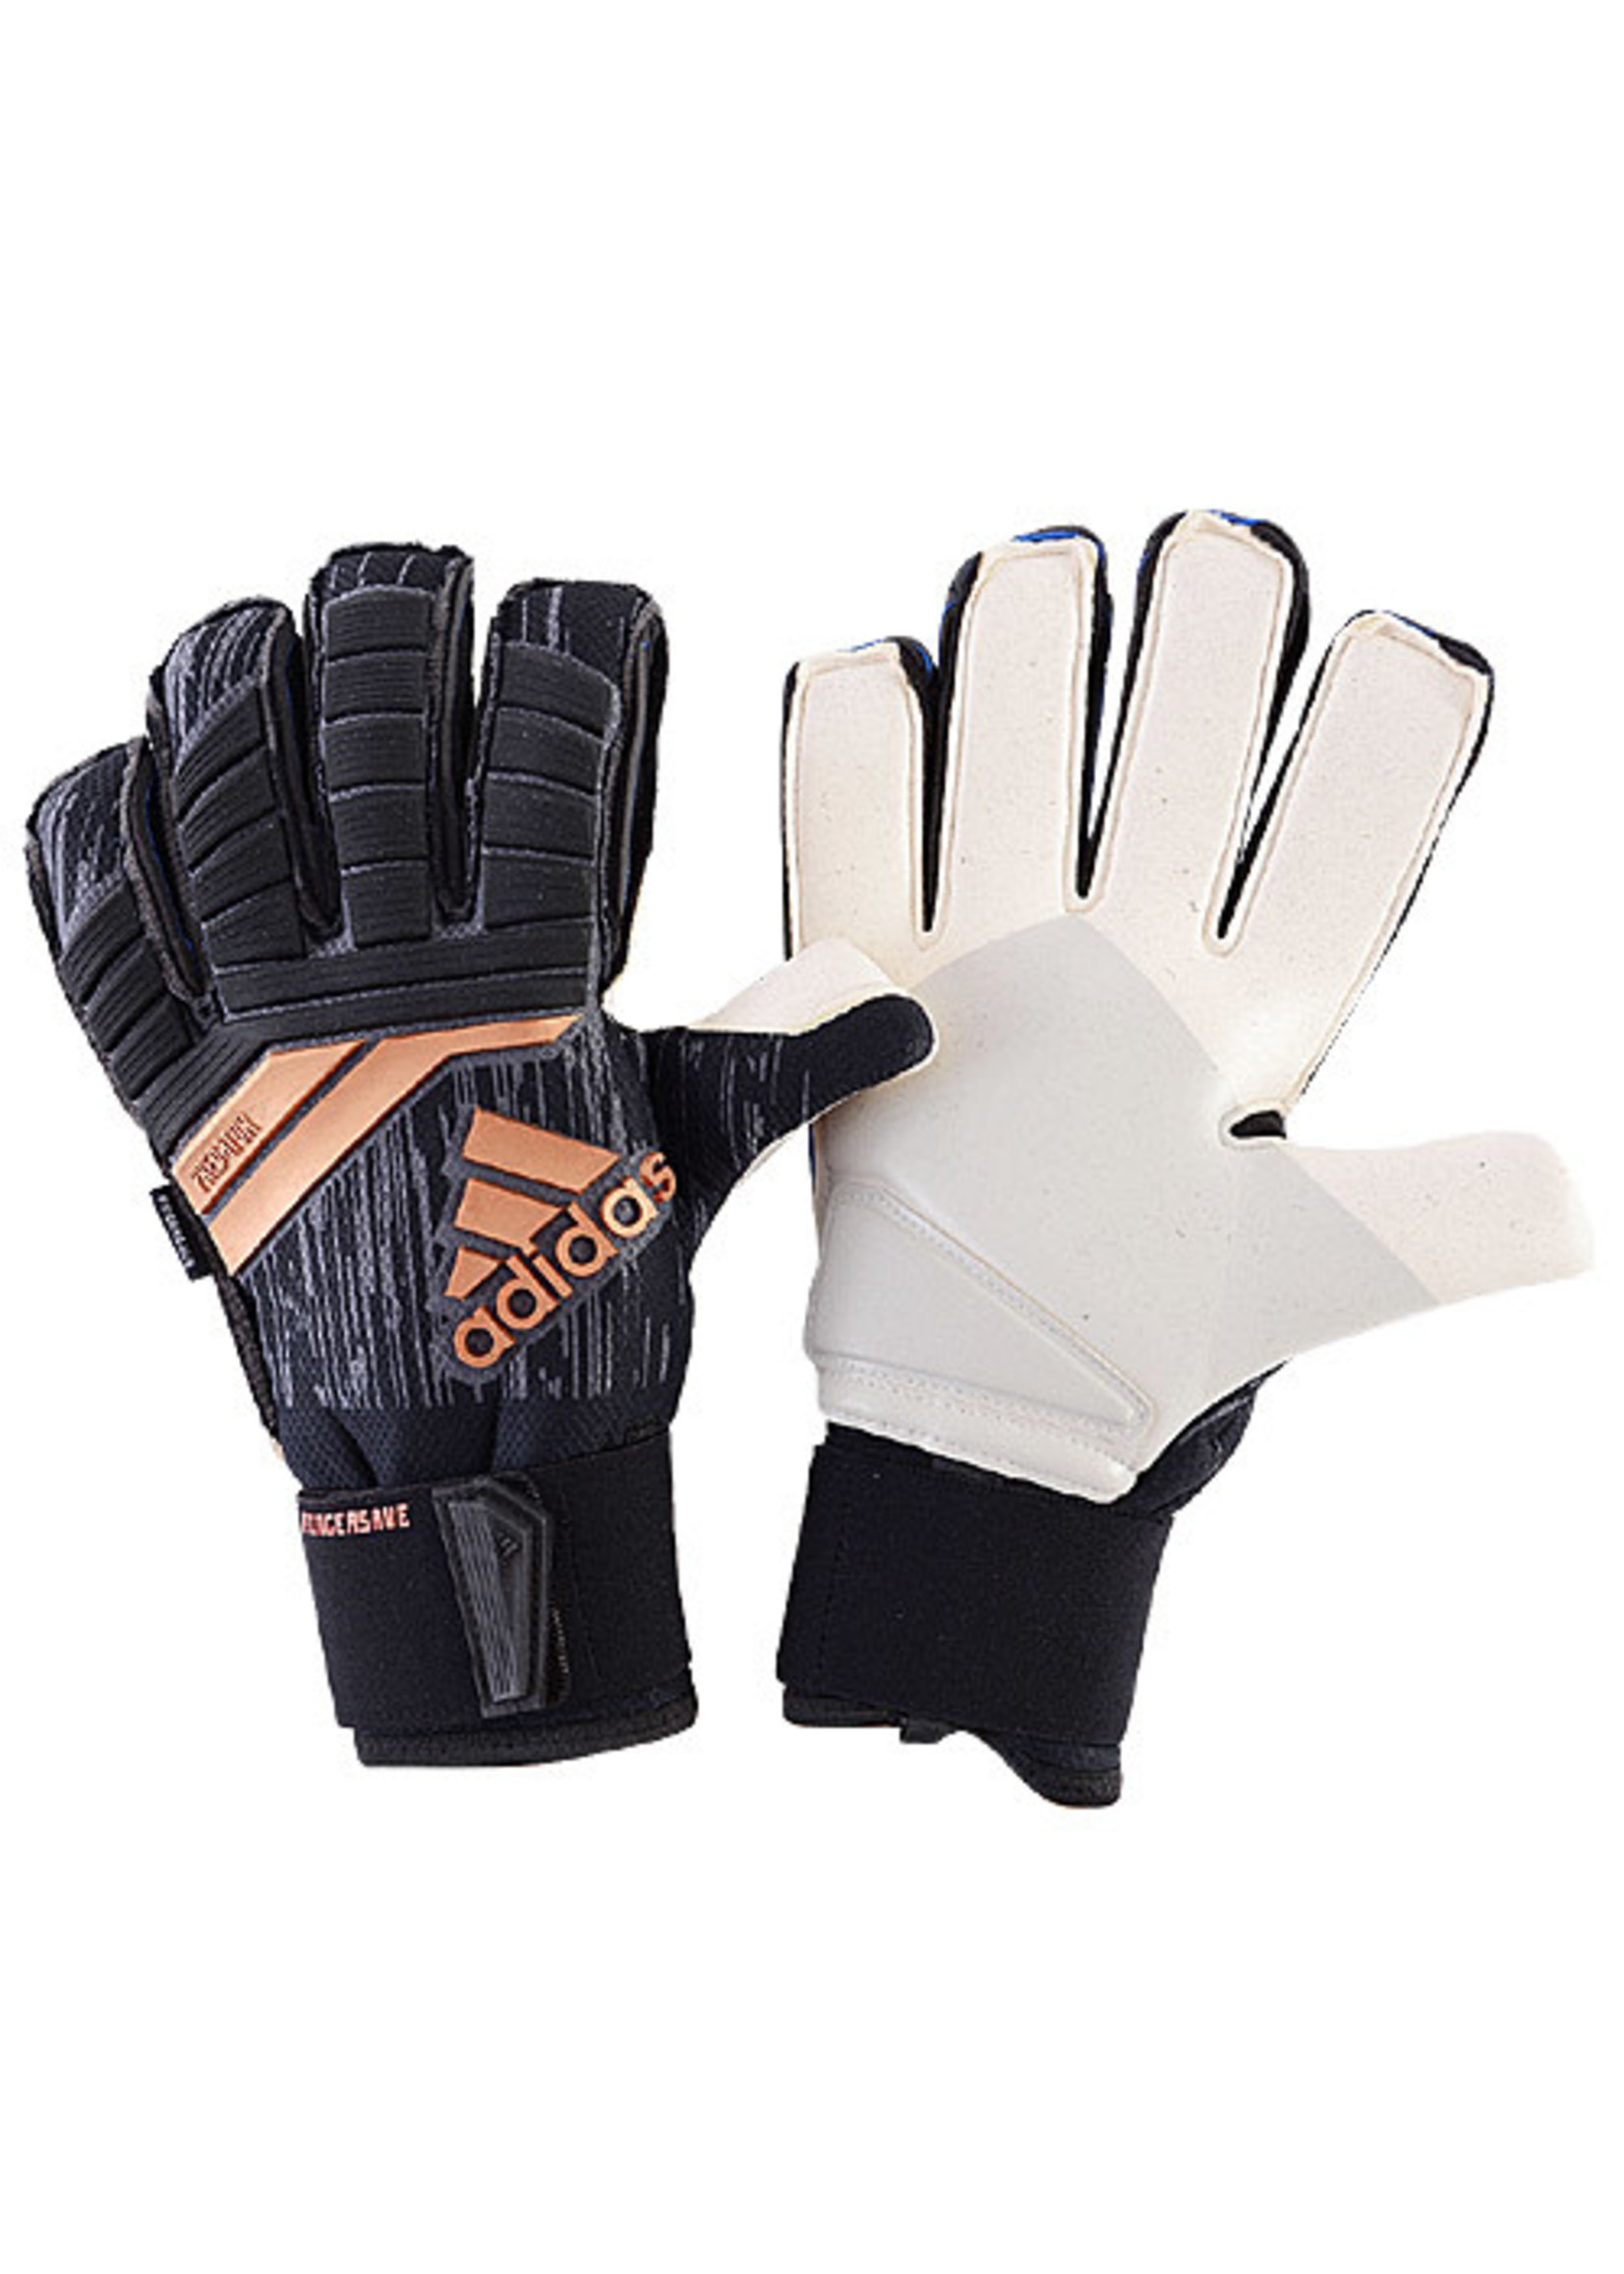 Adidas Predator Pro FS